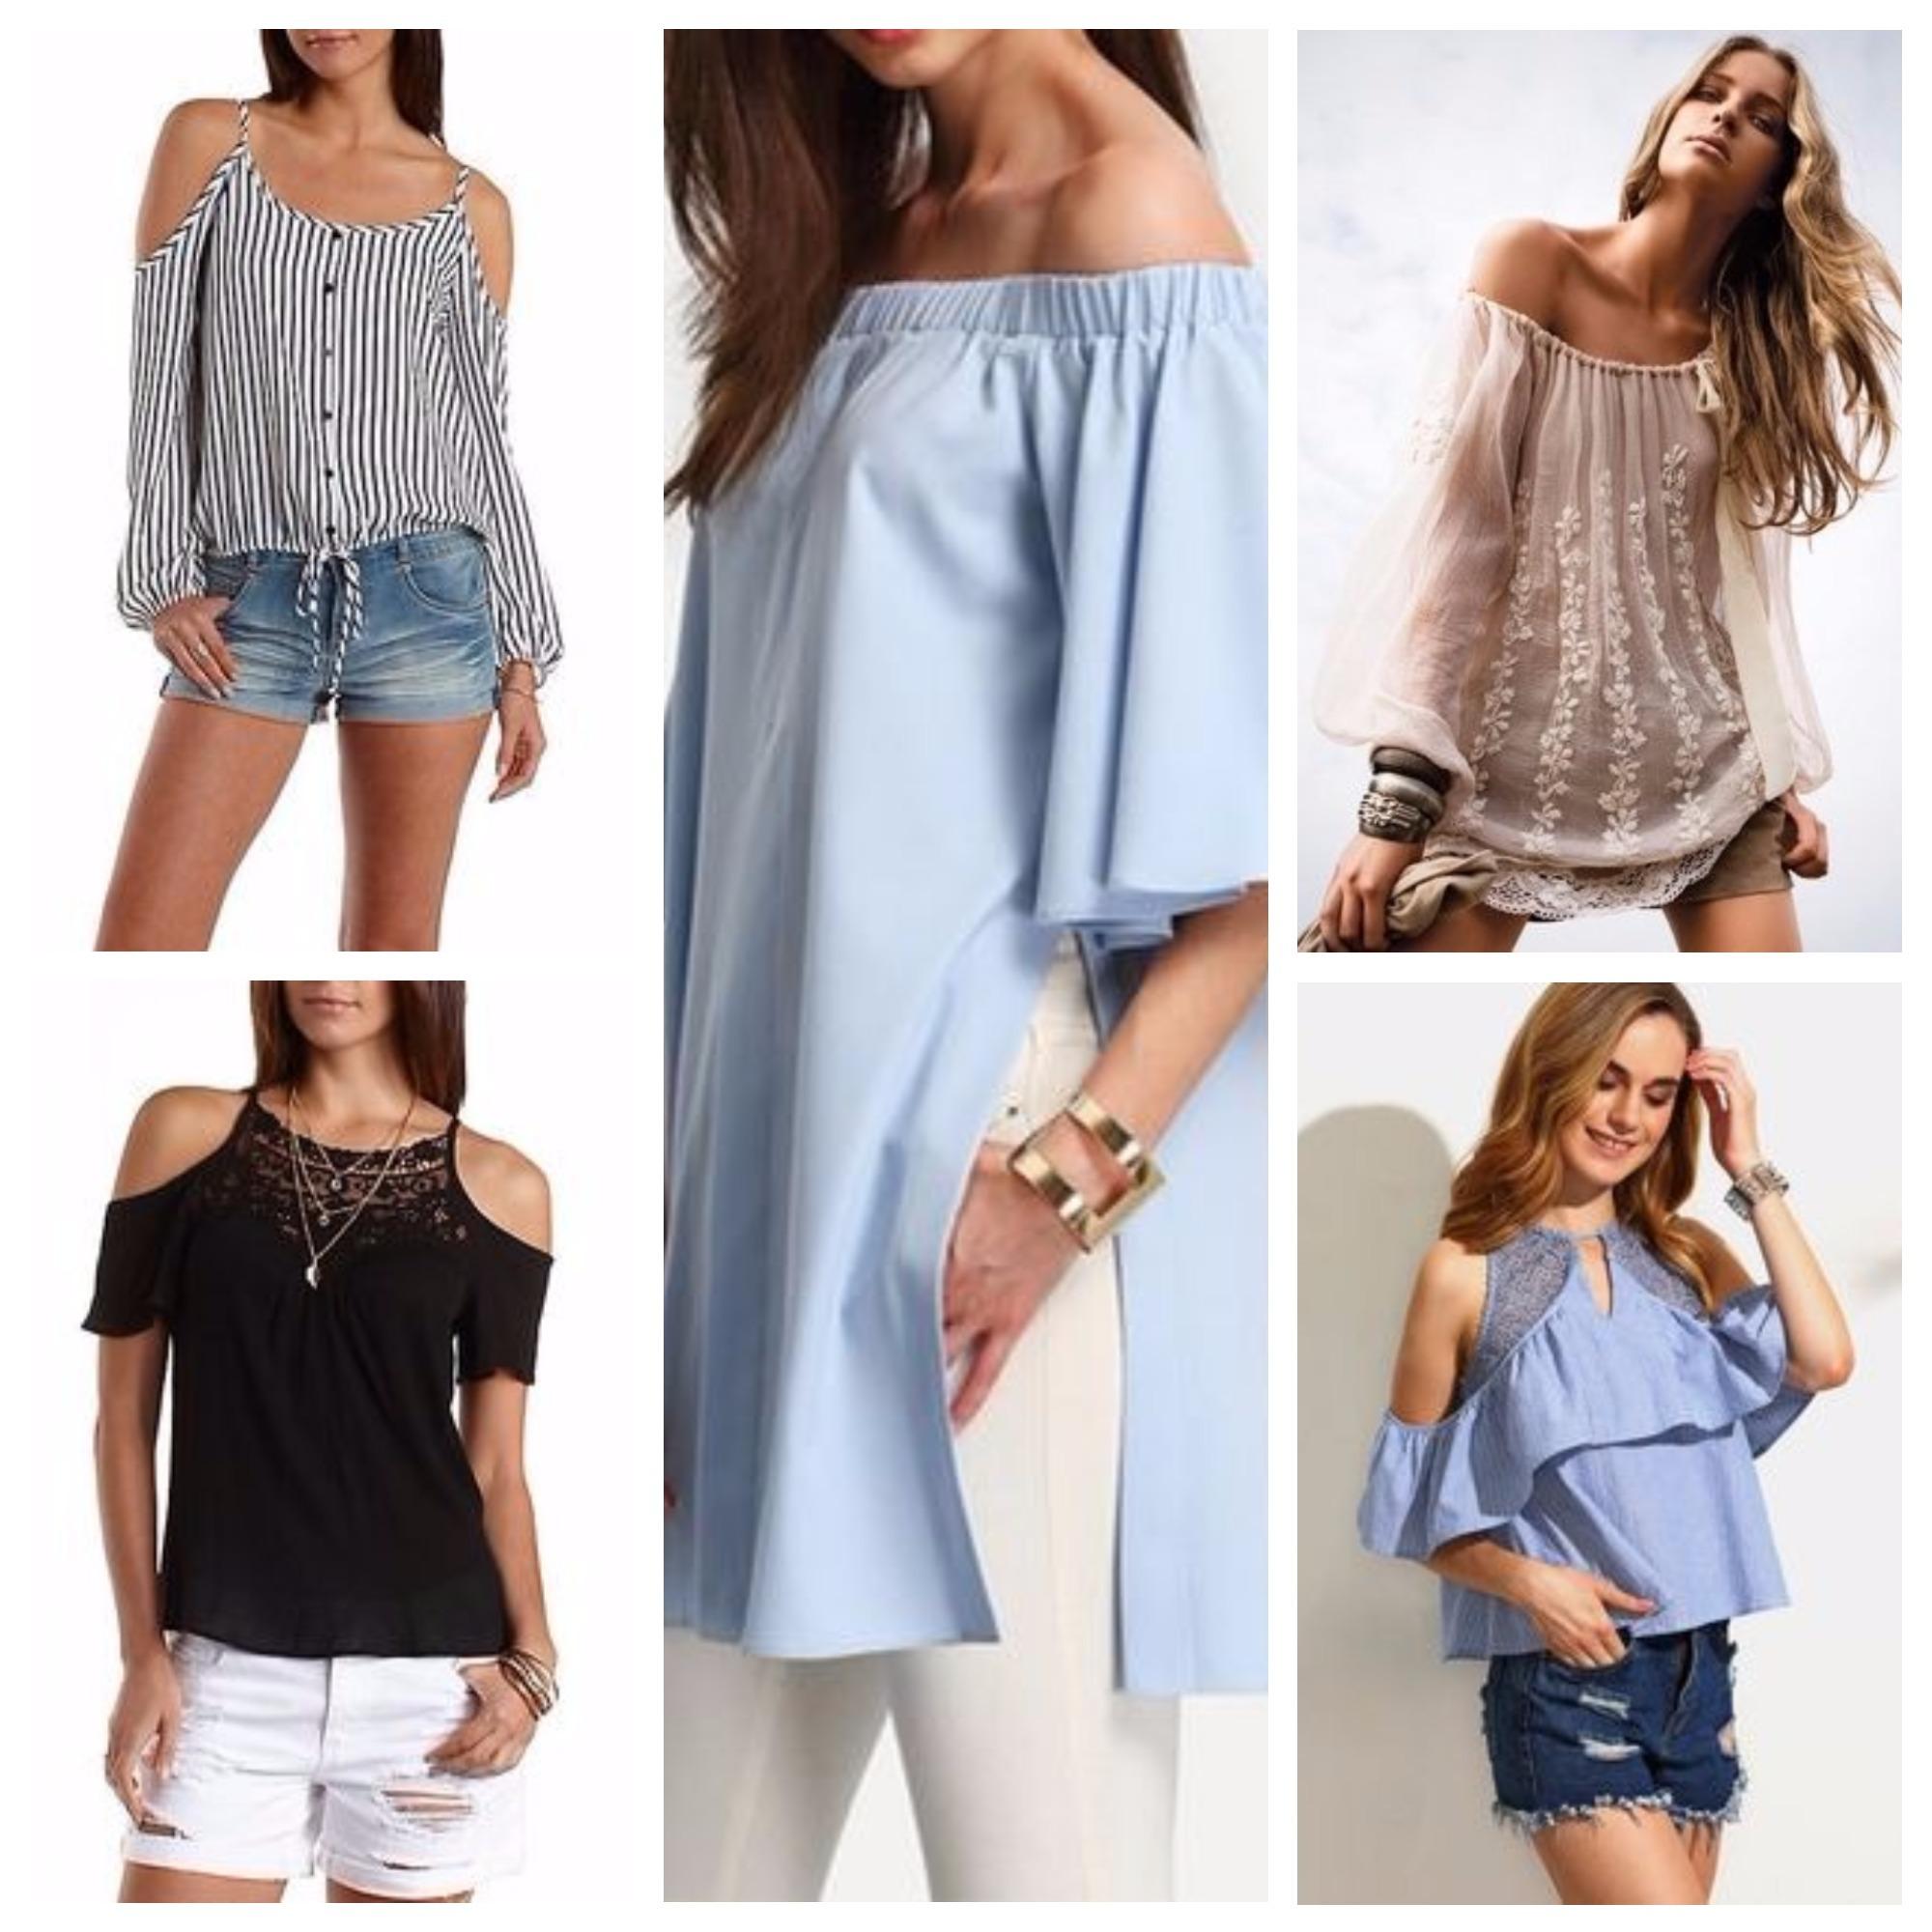 a6bd4524175 Летние блузки 2018 года  модные тенденции